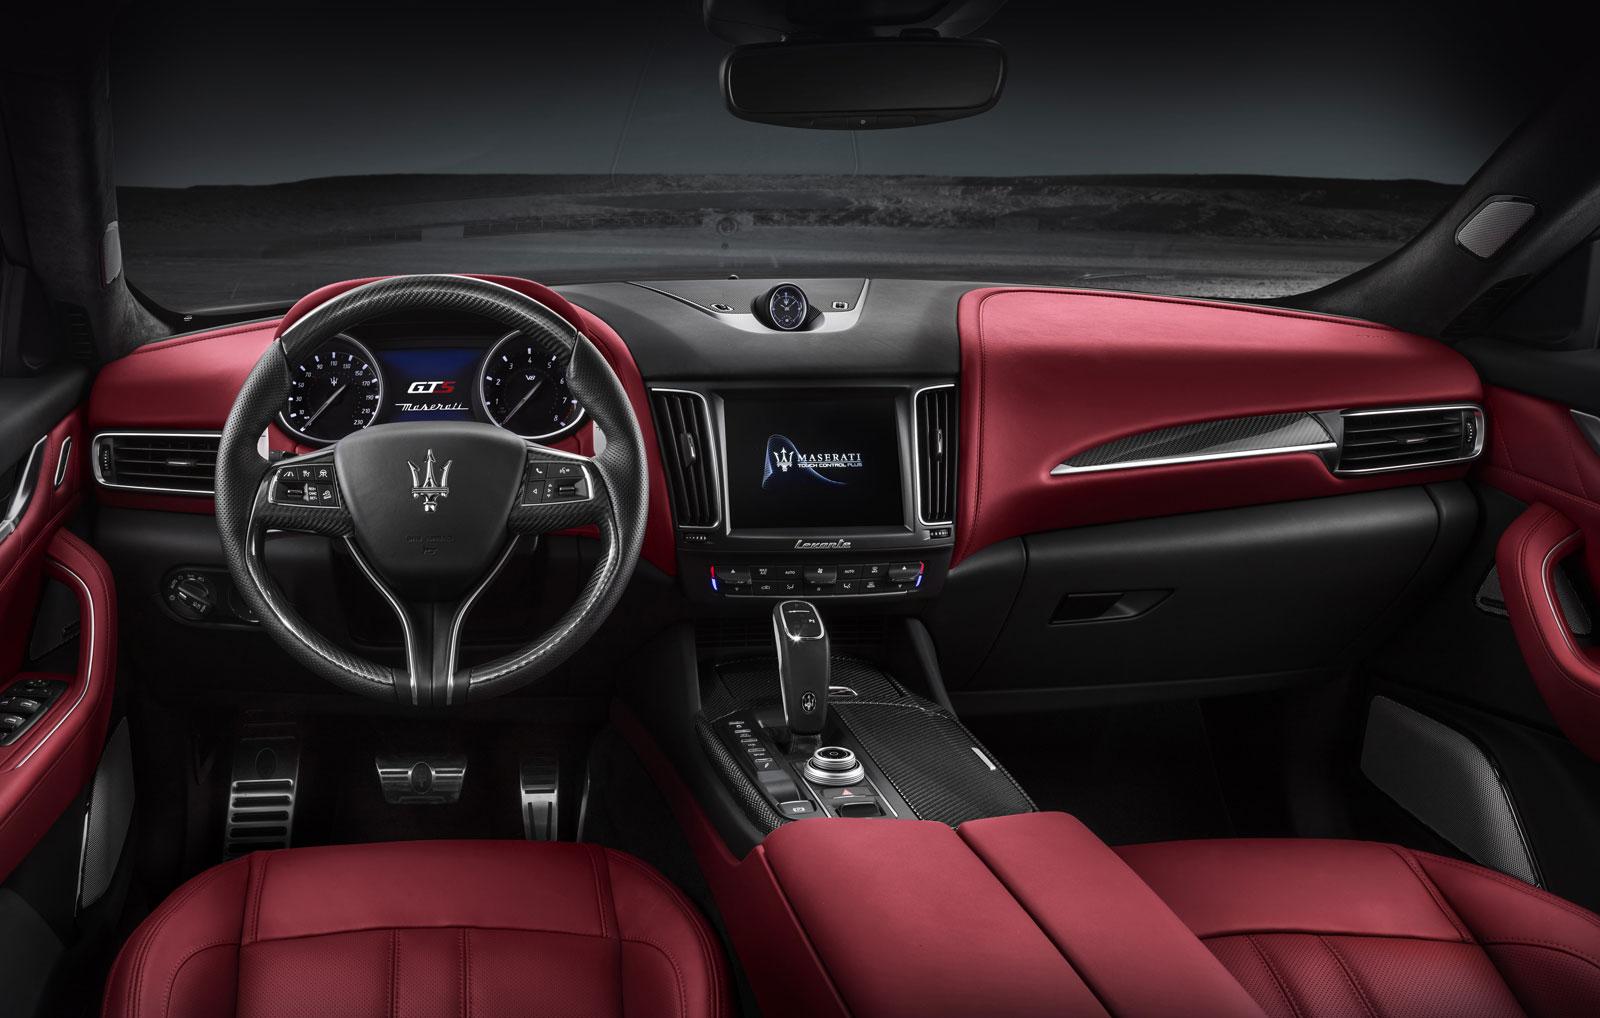 Maserati Levante Gts Interior Design